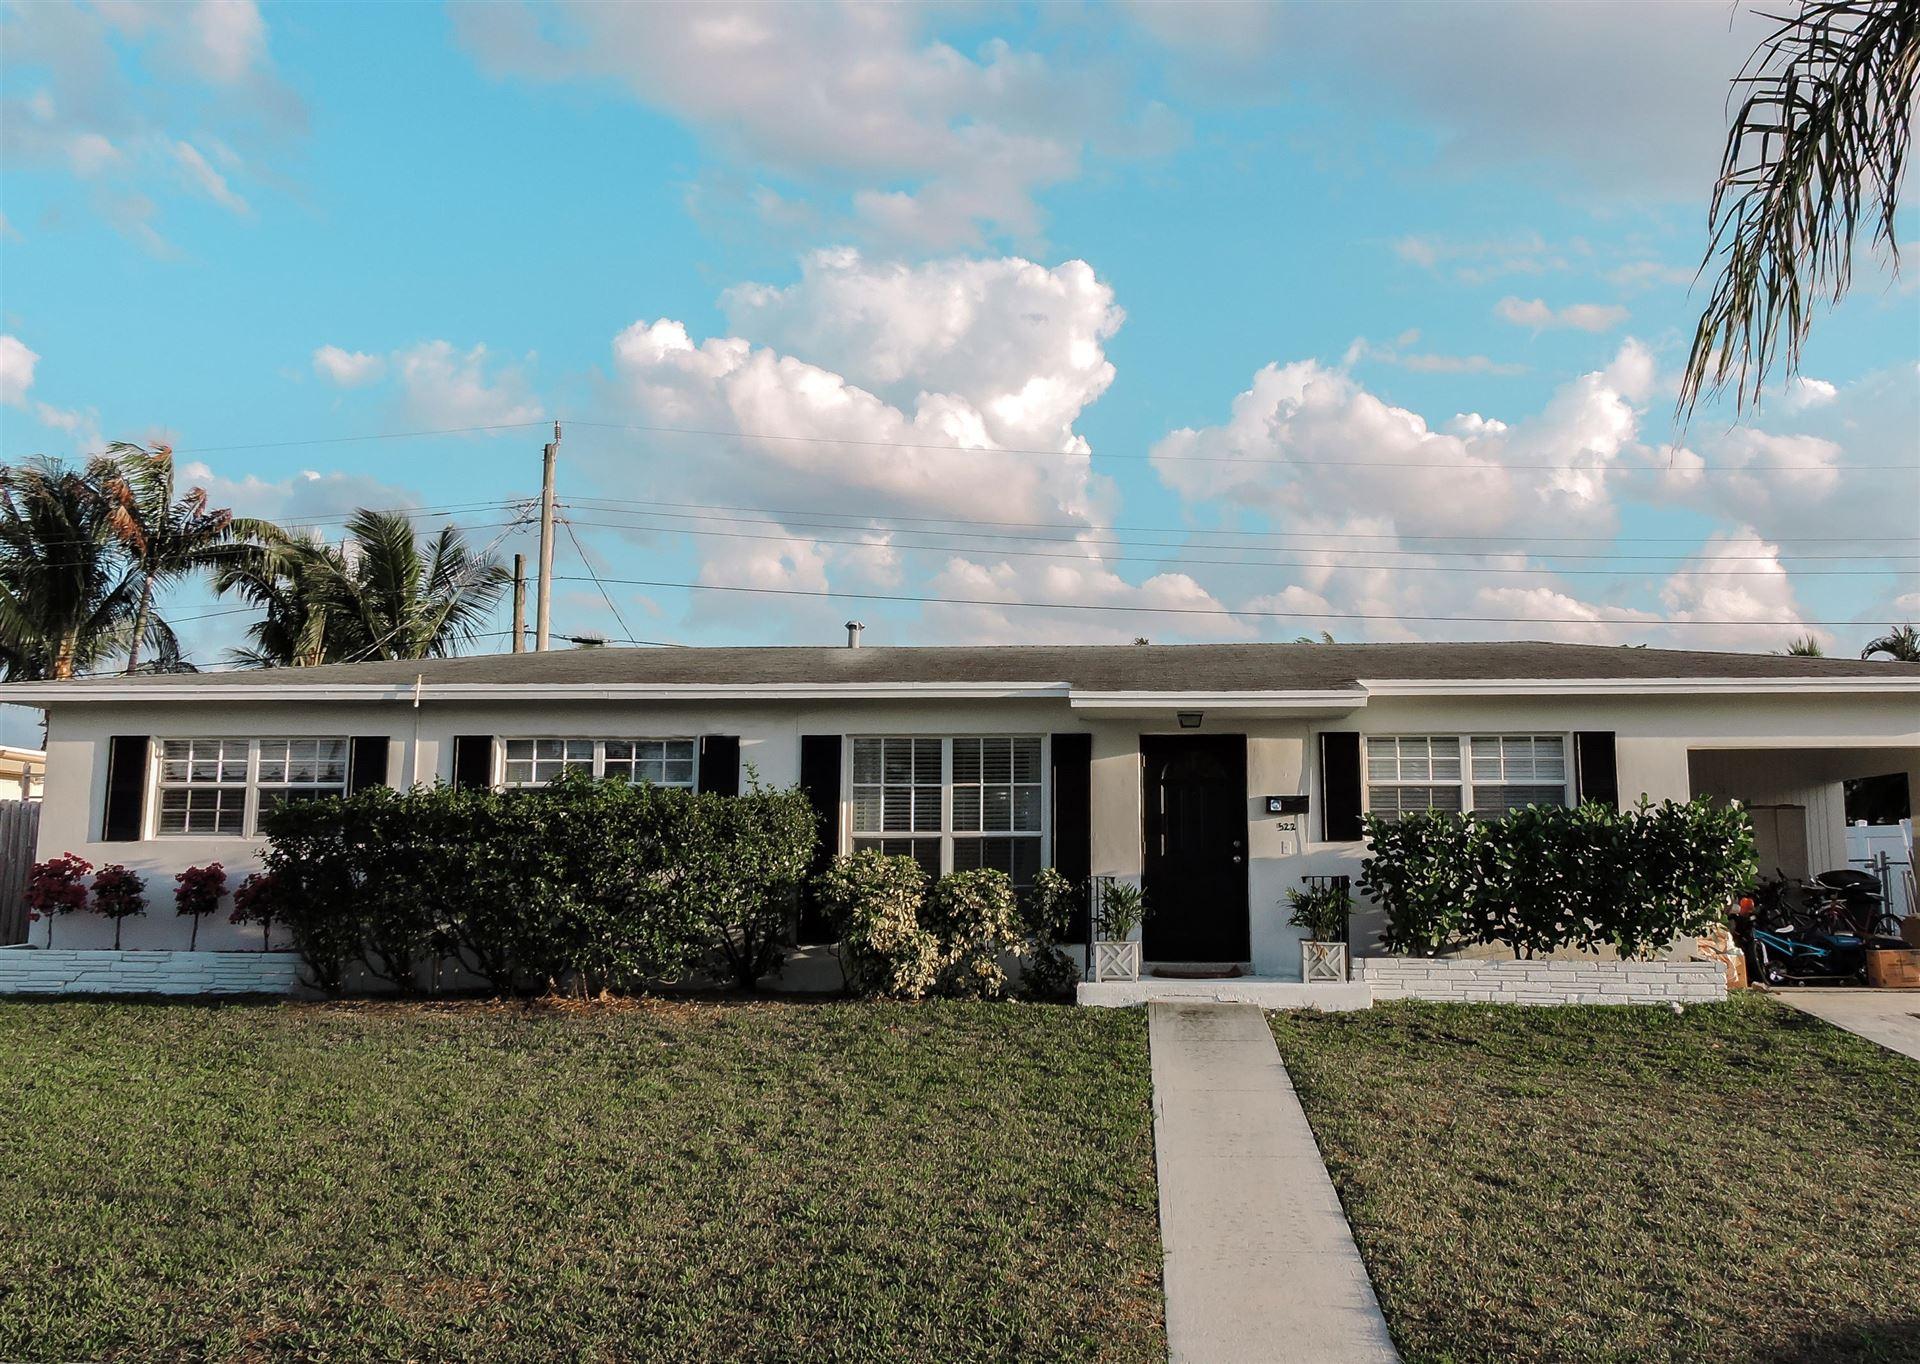 Photo of 522 Ebbtide Drive, North Palm Beach, FL 33408 (MLS # RX-10693848)